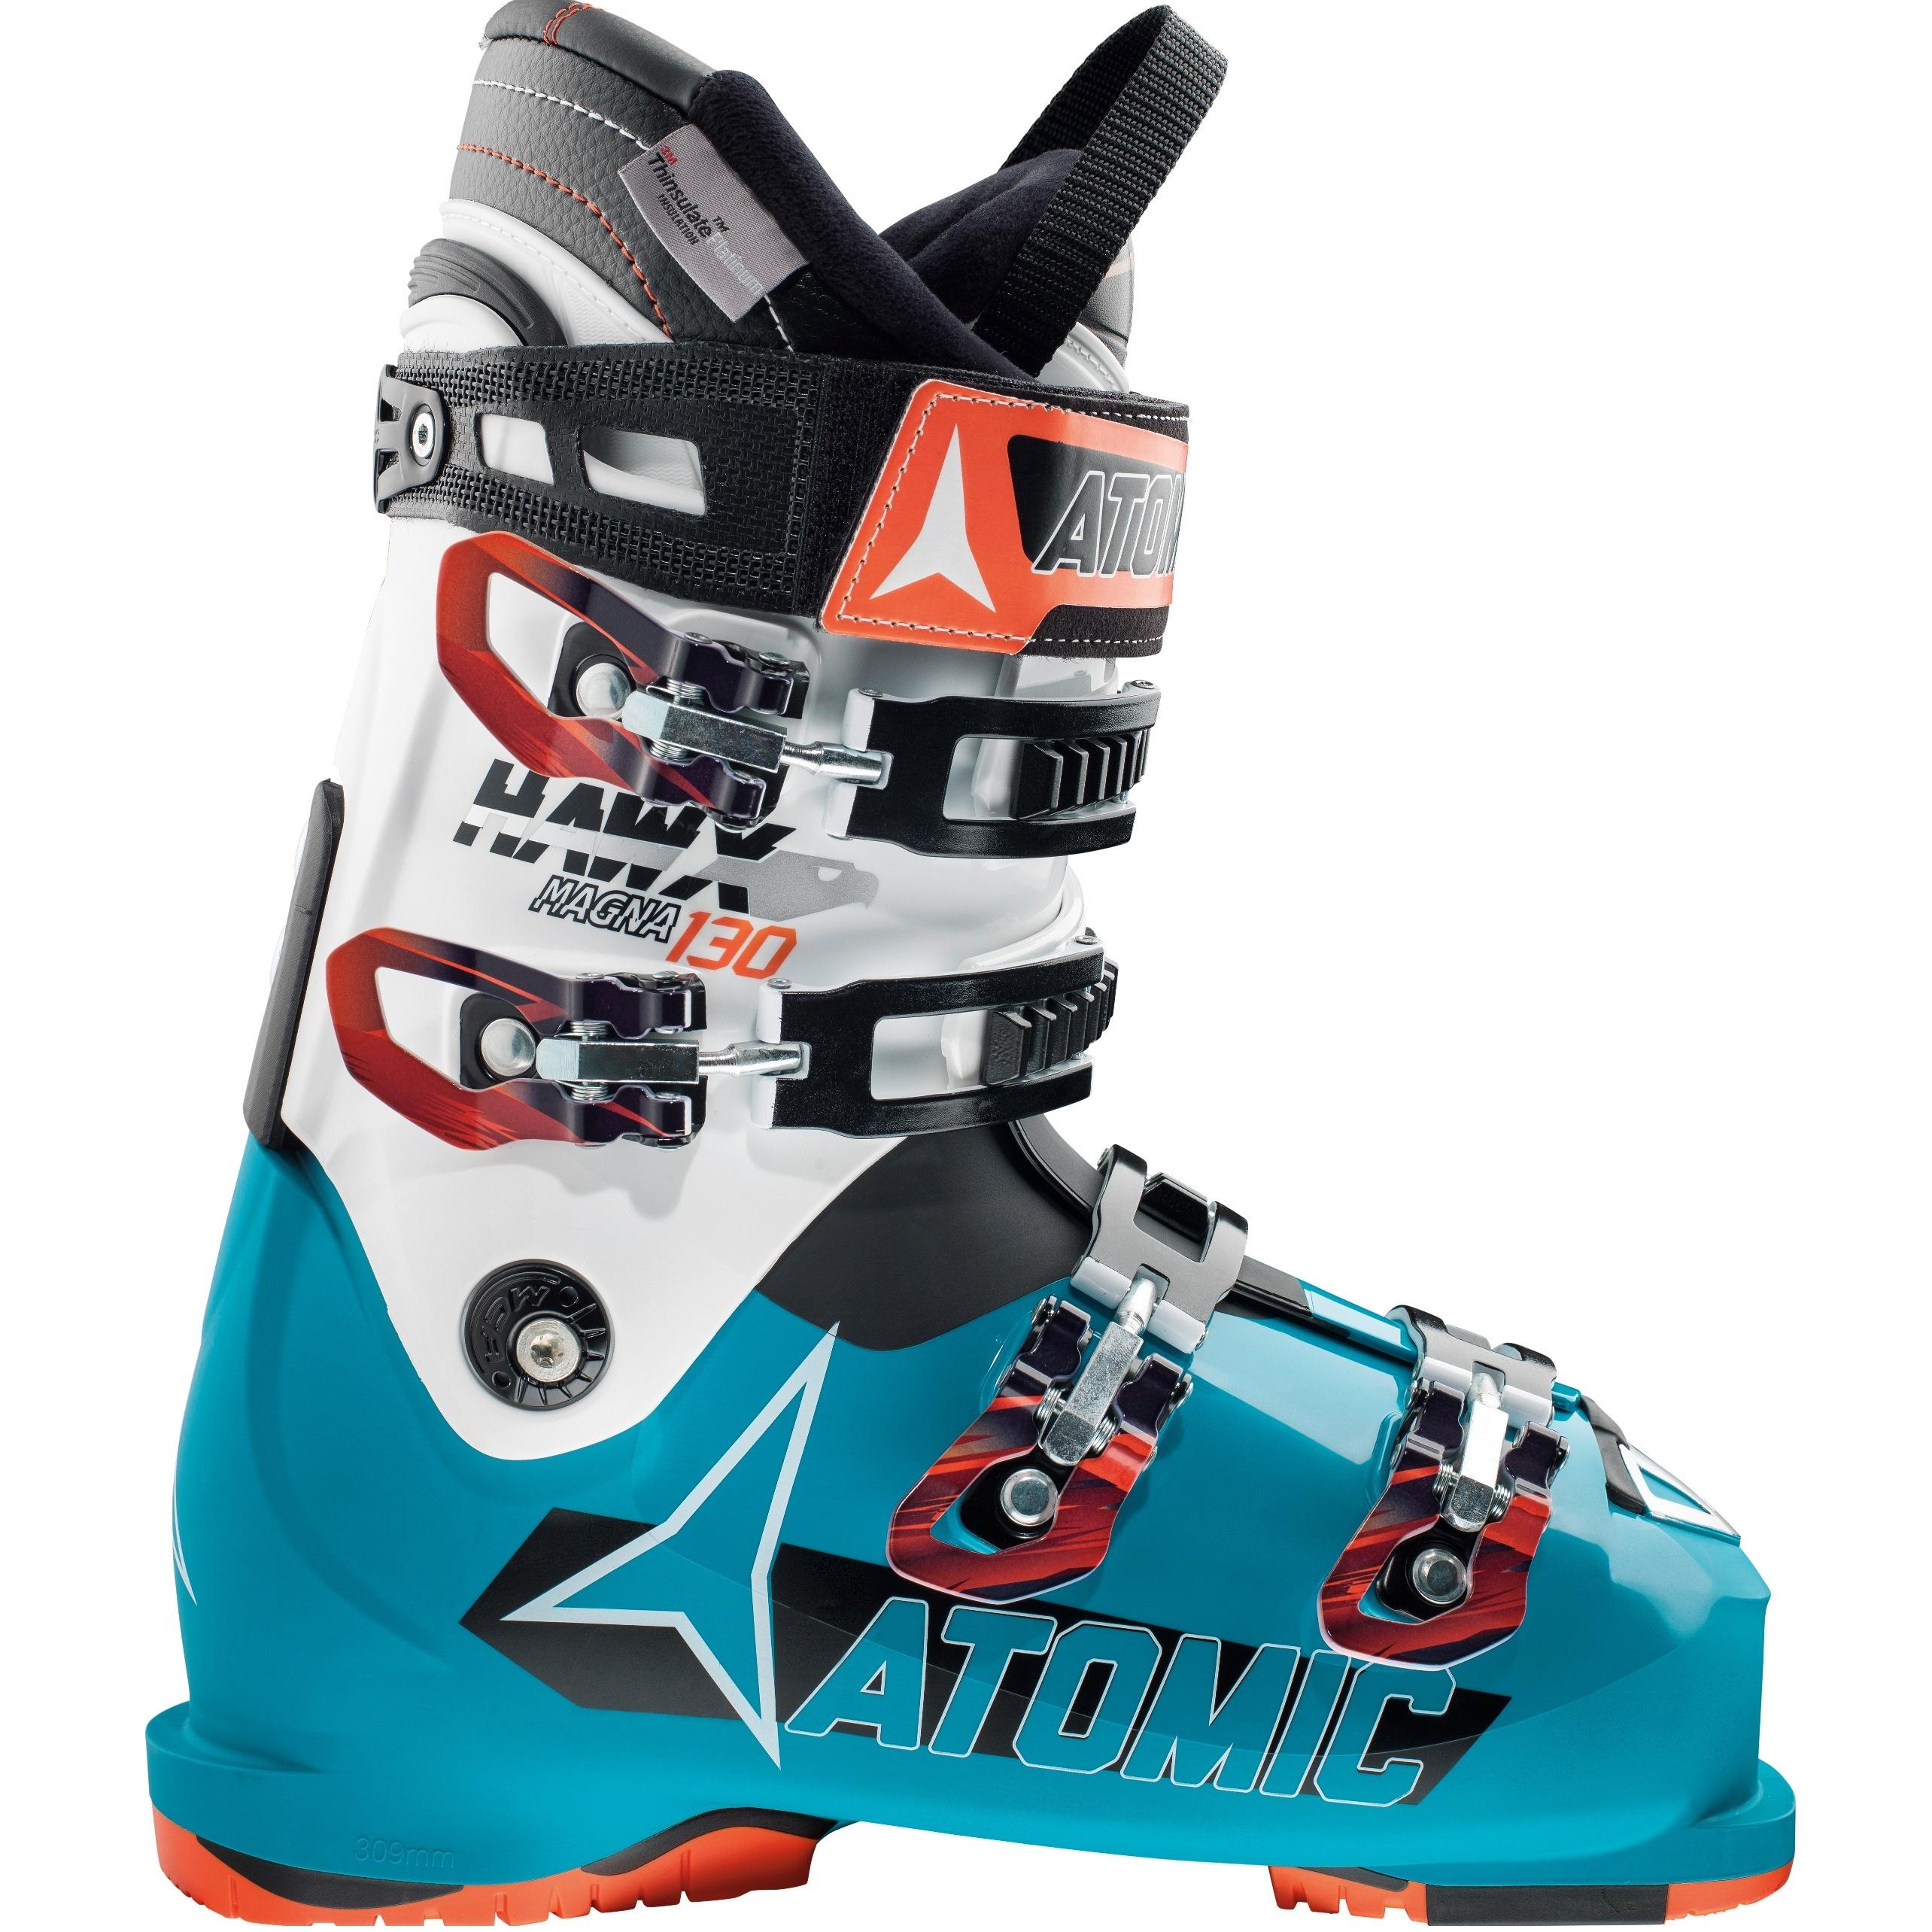 separation shoes 2dc66 2c5ea Ski Boots   Atomic Hawx MAGNA 130   Ski